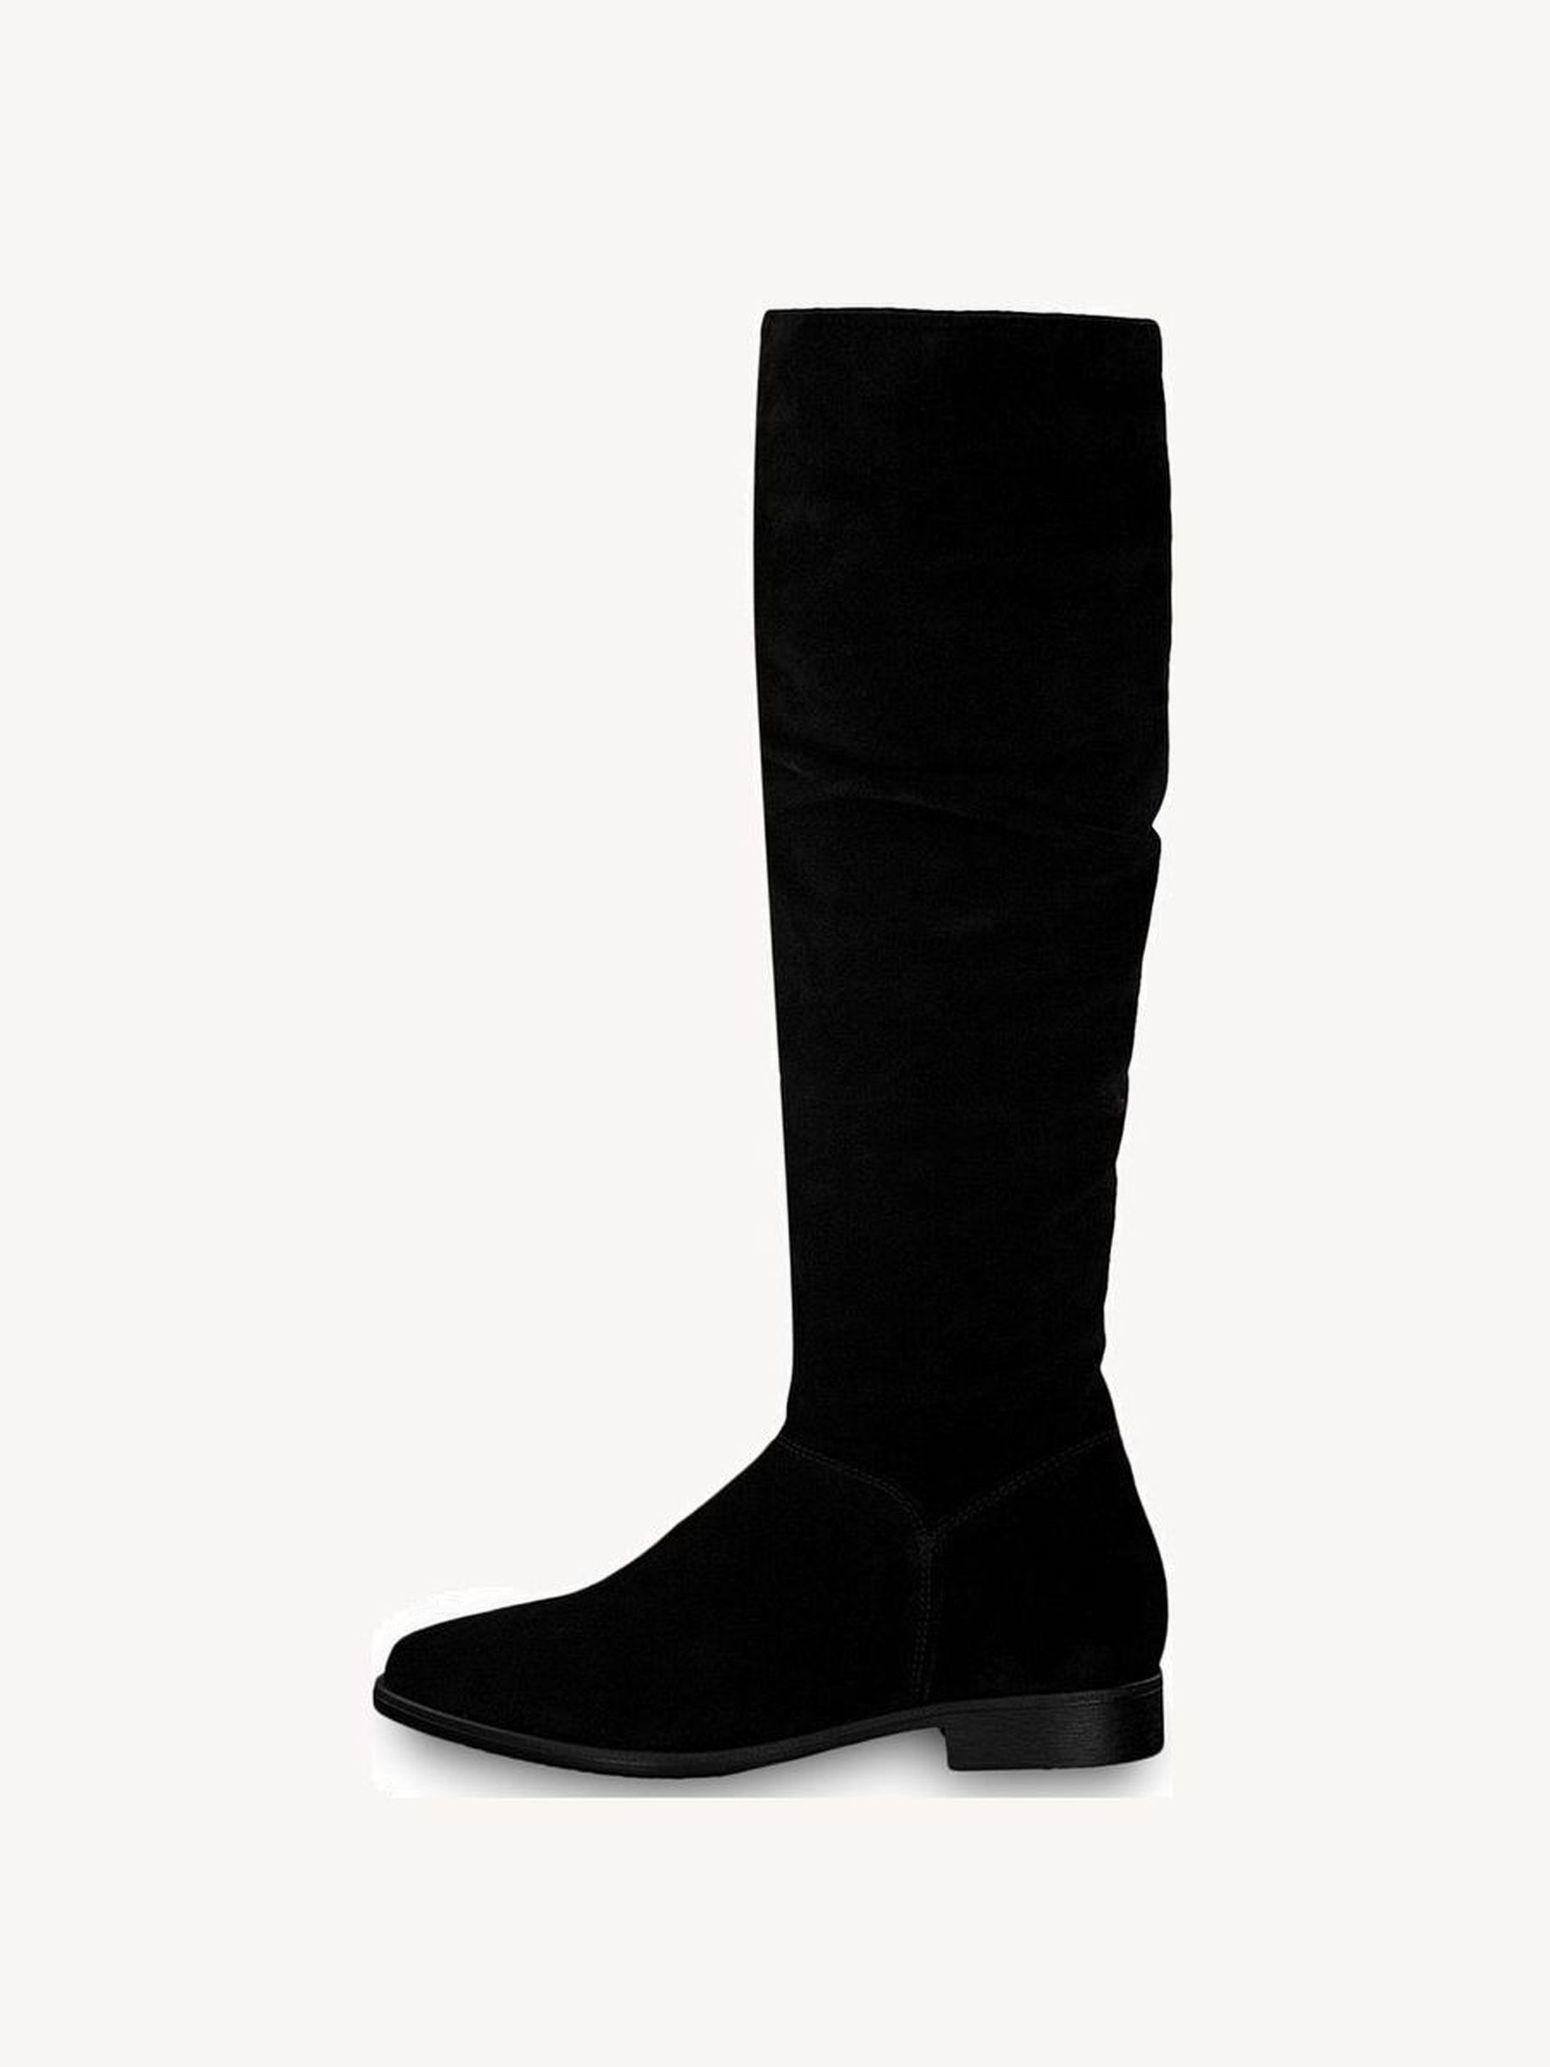 Tamaris Stiefel BLACK Art.:1 1 25546 21001   Tamaris Schuhe